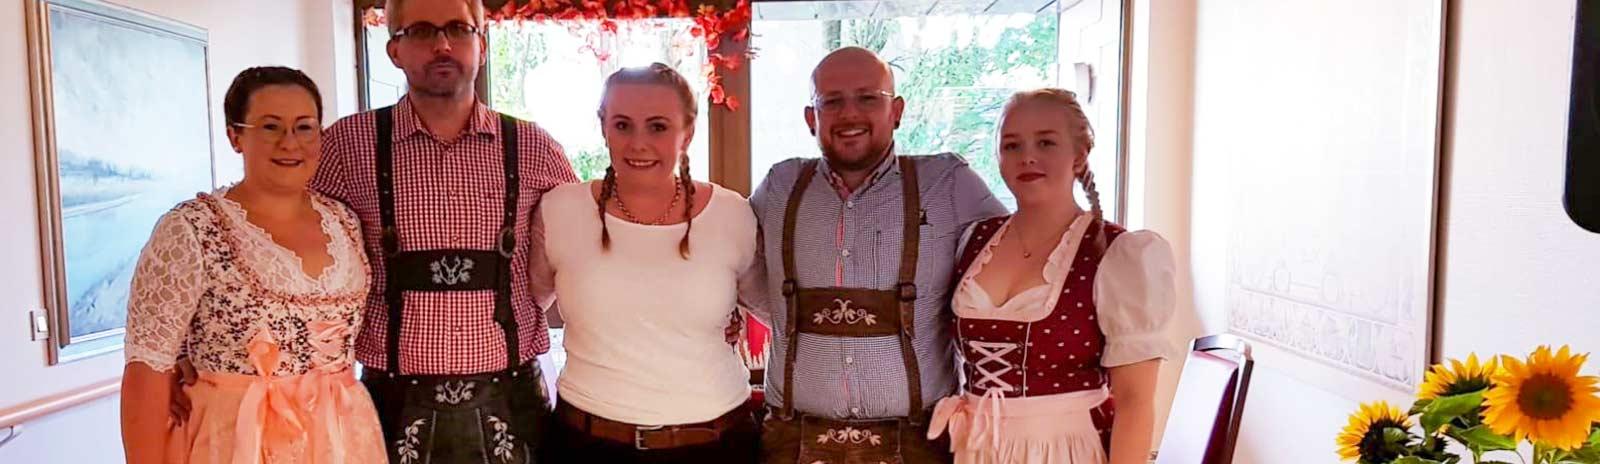 2019_09_26_Haus_St-Barbara_Oktoberfest_Slider